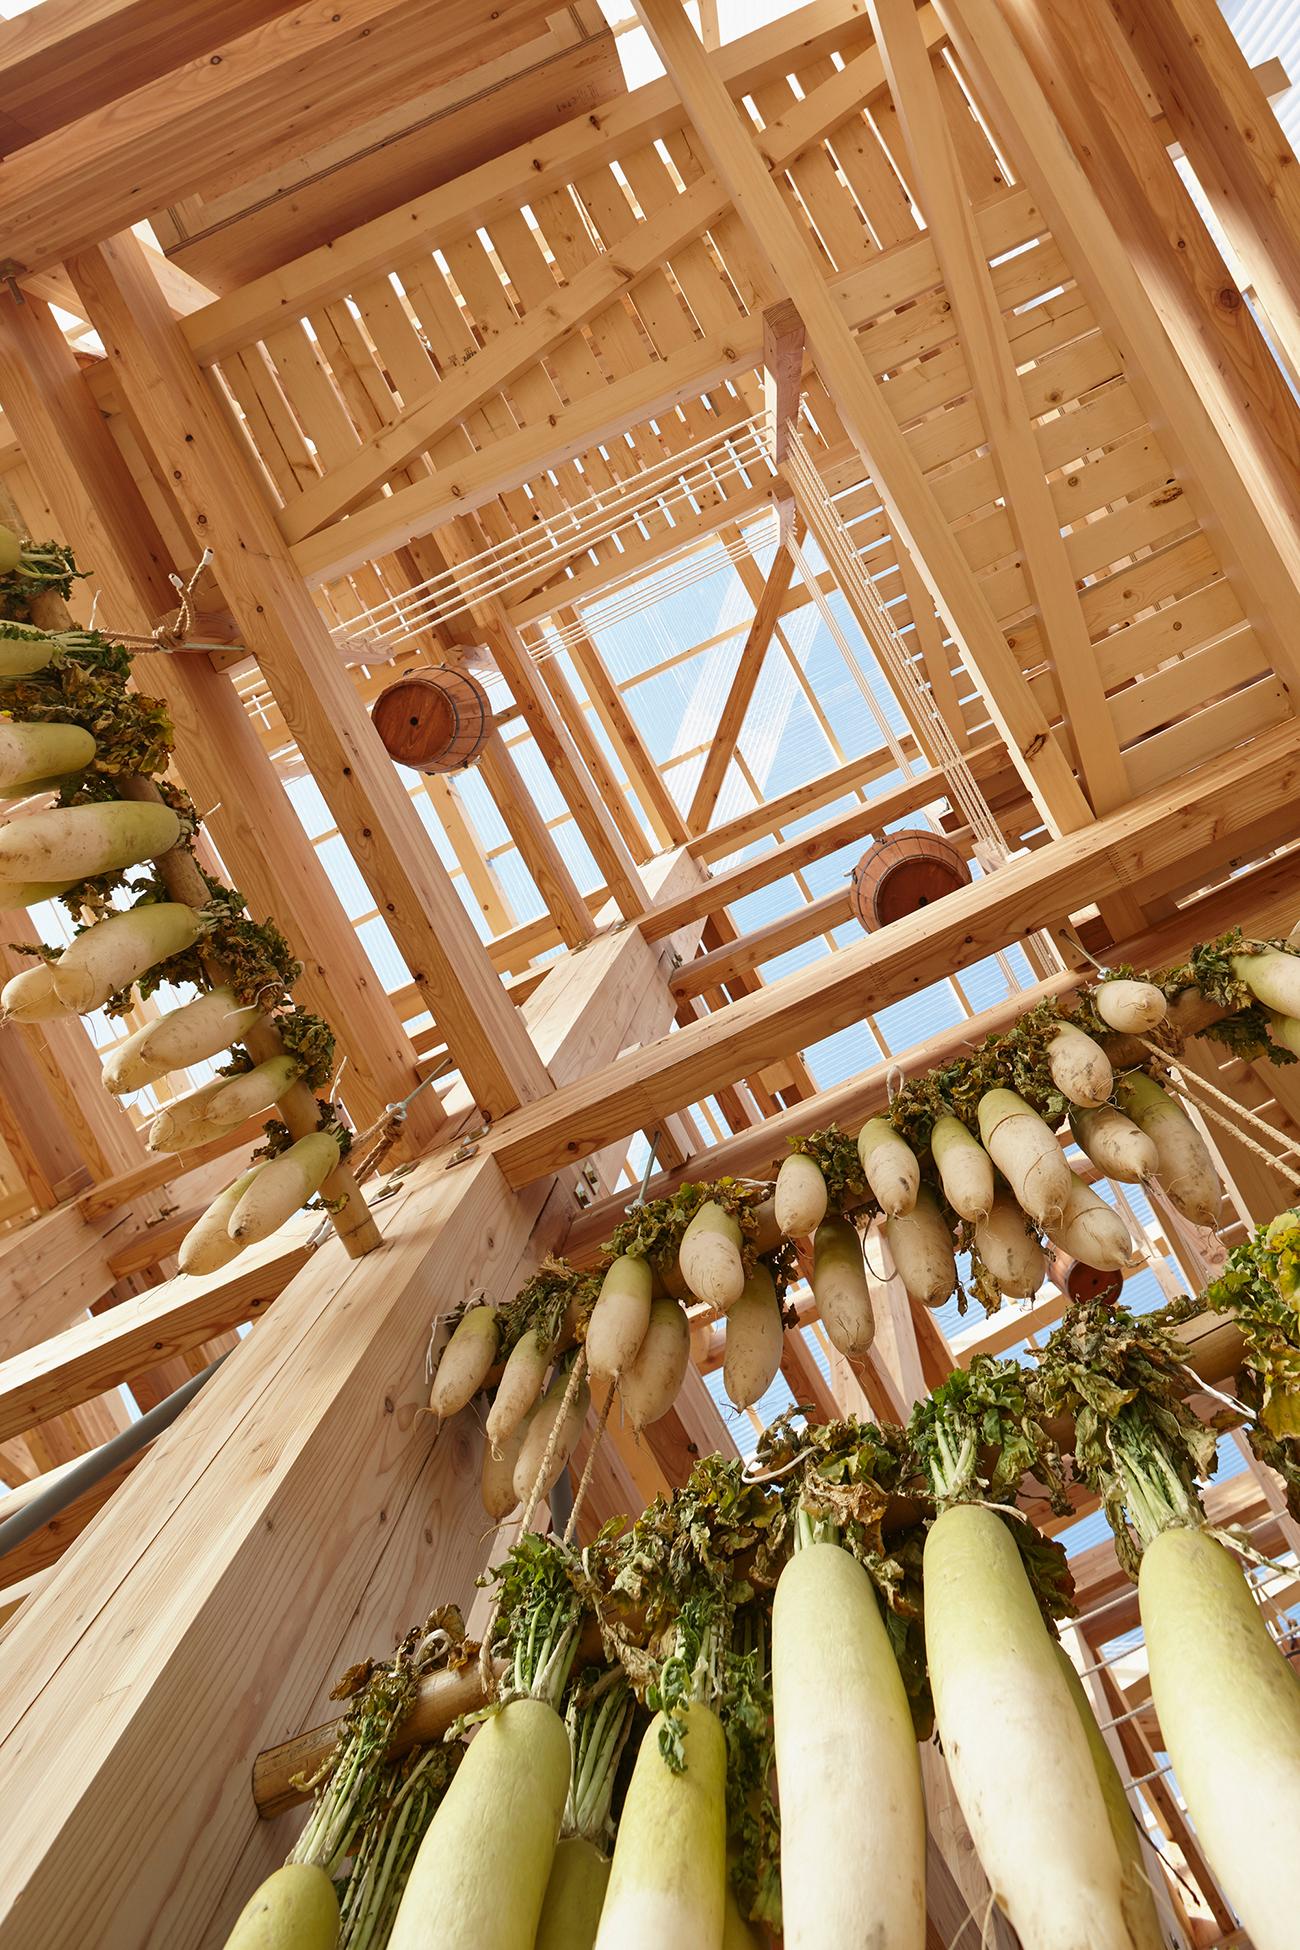 Kengo Kuma's Nest We Grow Opens at UC Berkeley